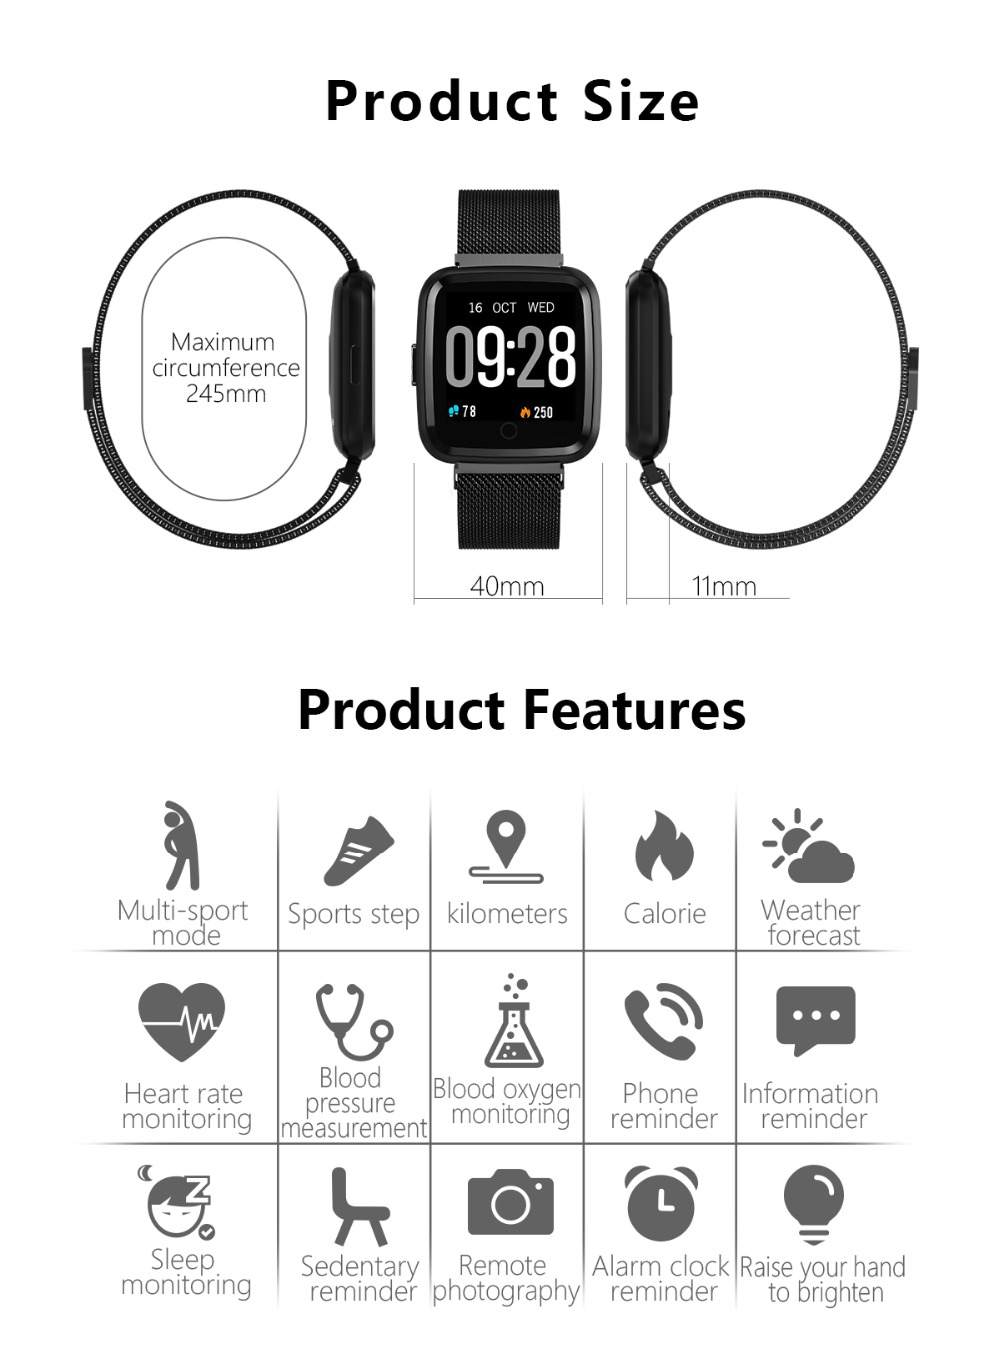 Huawise Y7 smartwatch 11